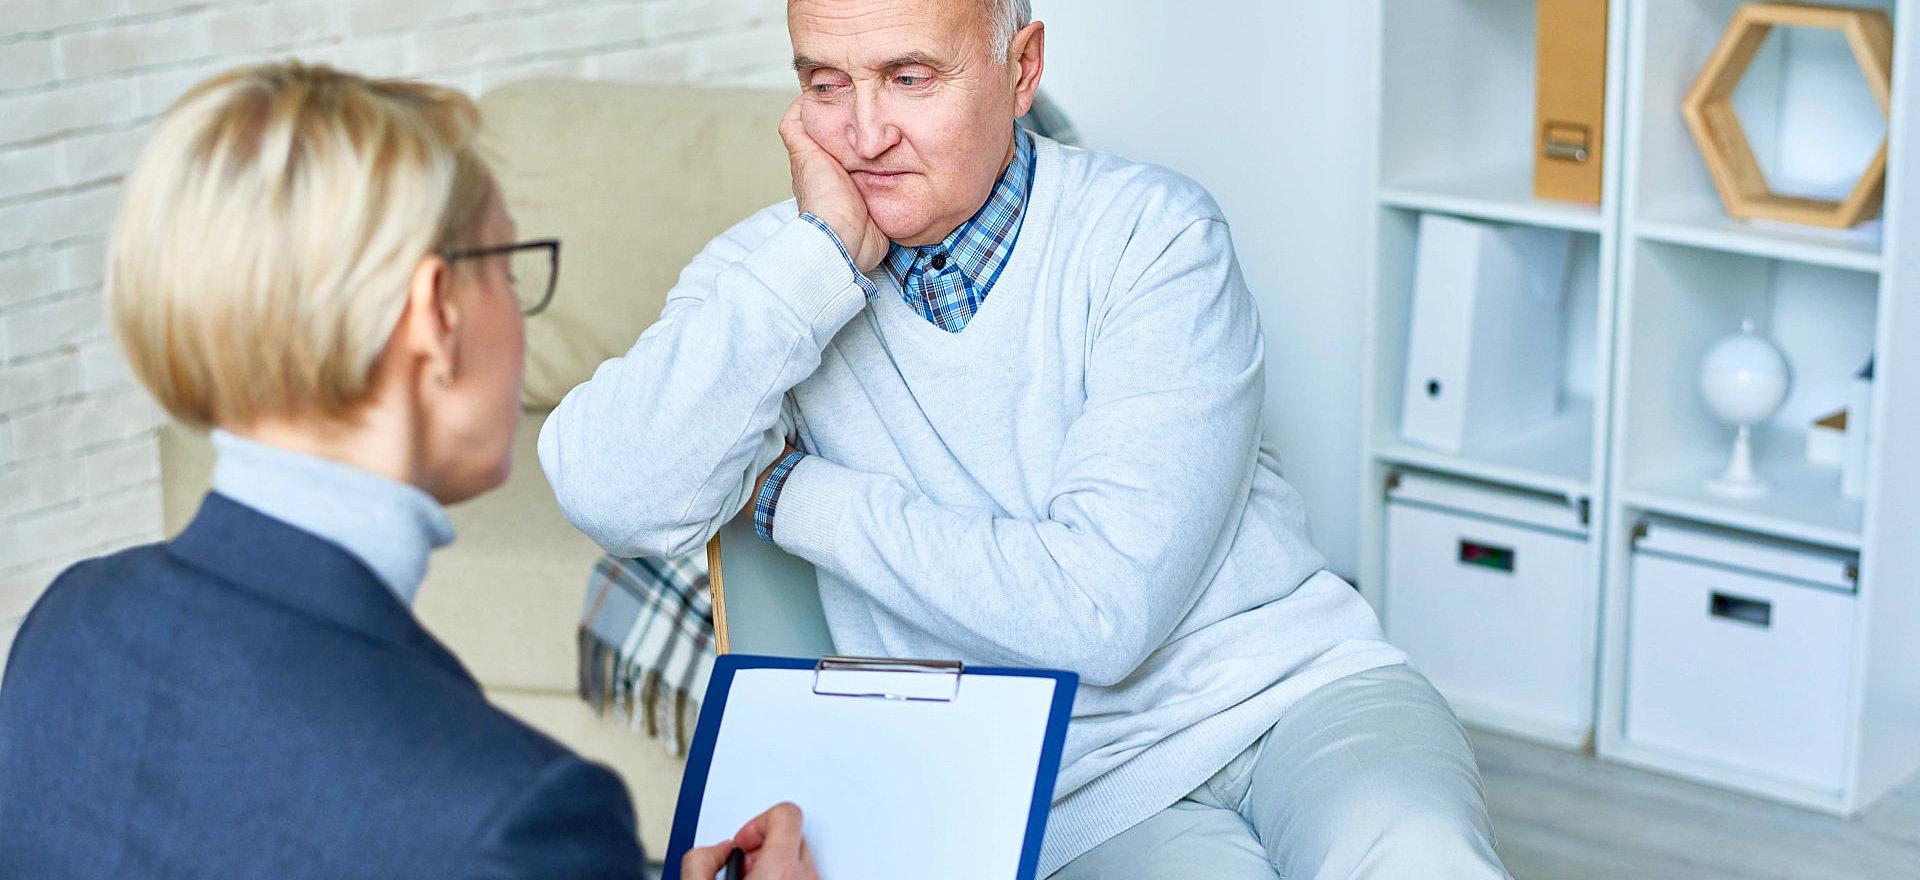 therapist interviewing an elderly man